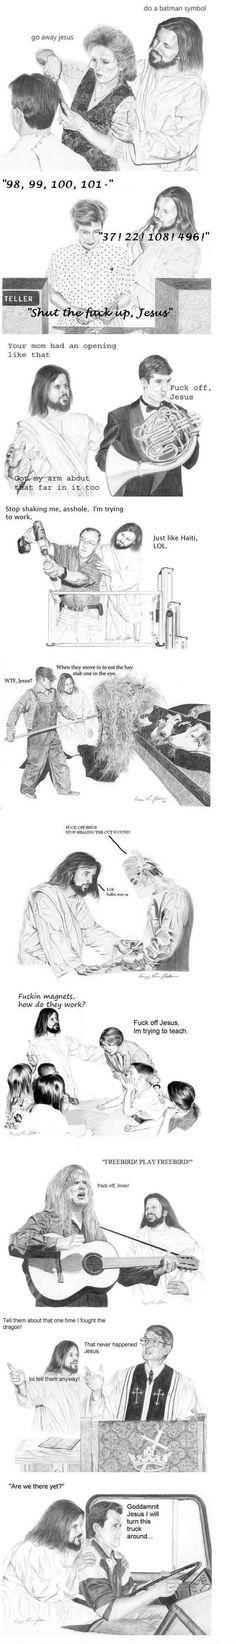 Jesus tries